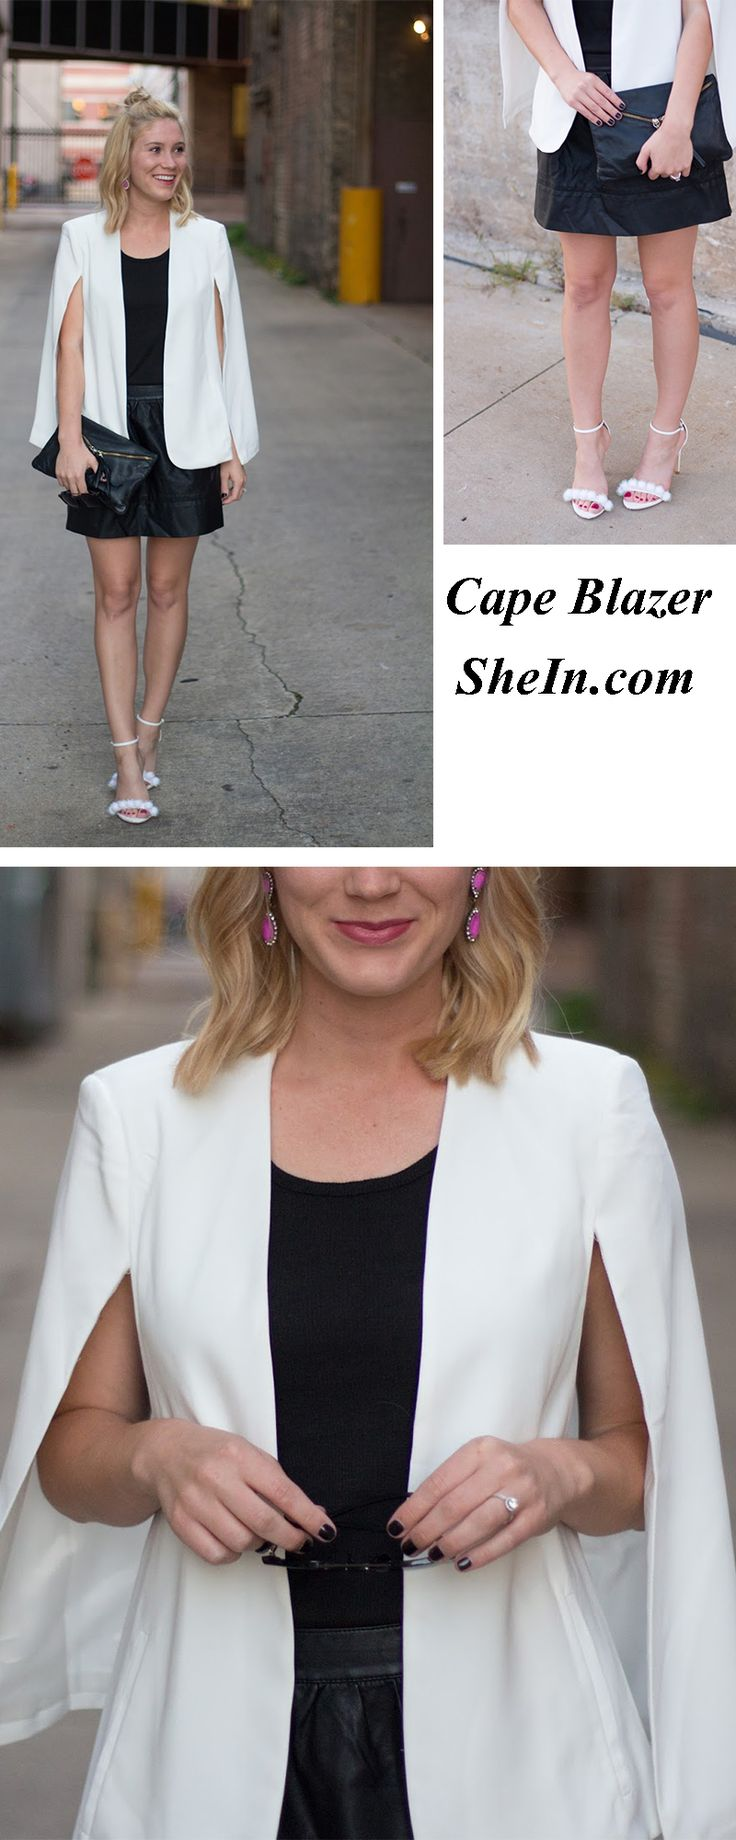 White Long Sleeve Casual Cape Blazer - Love this cape blazer!! So smart yet so chic ♥ Shein.com